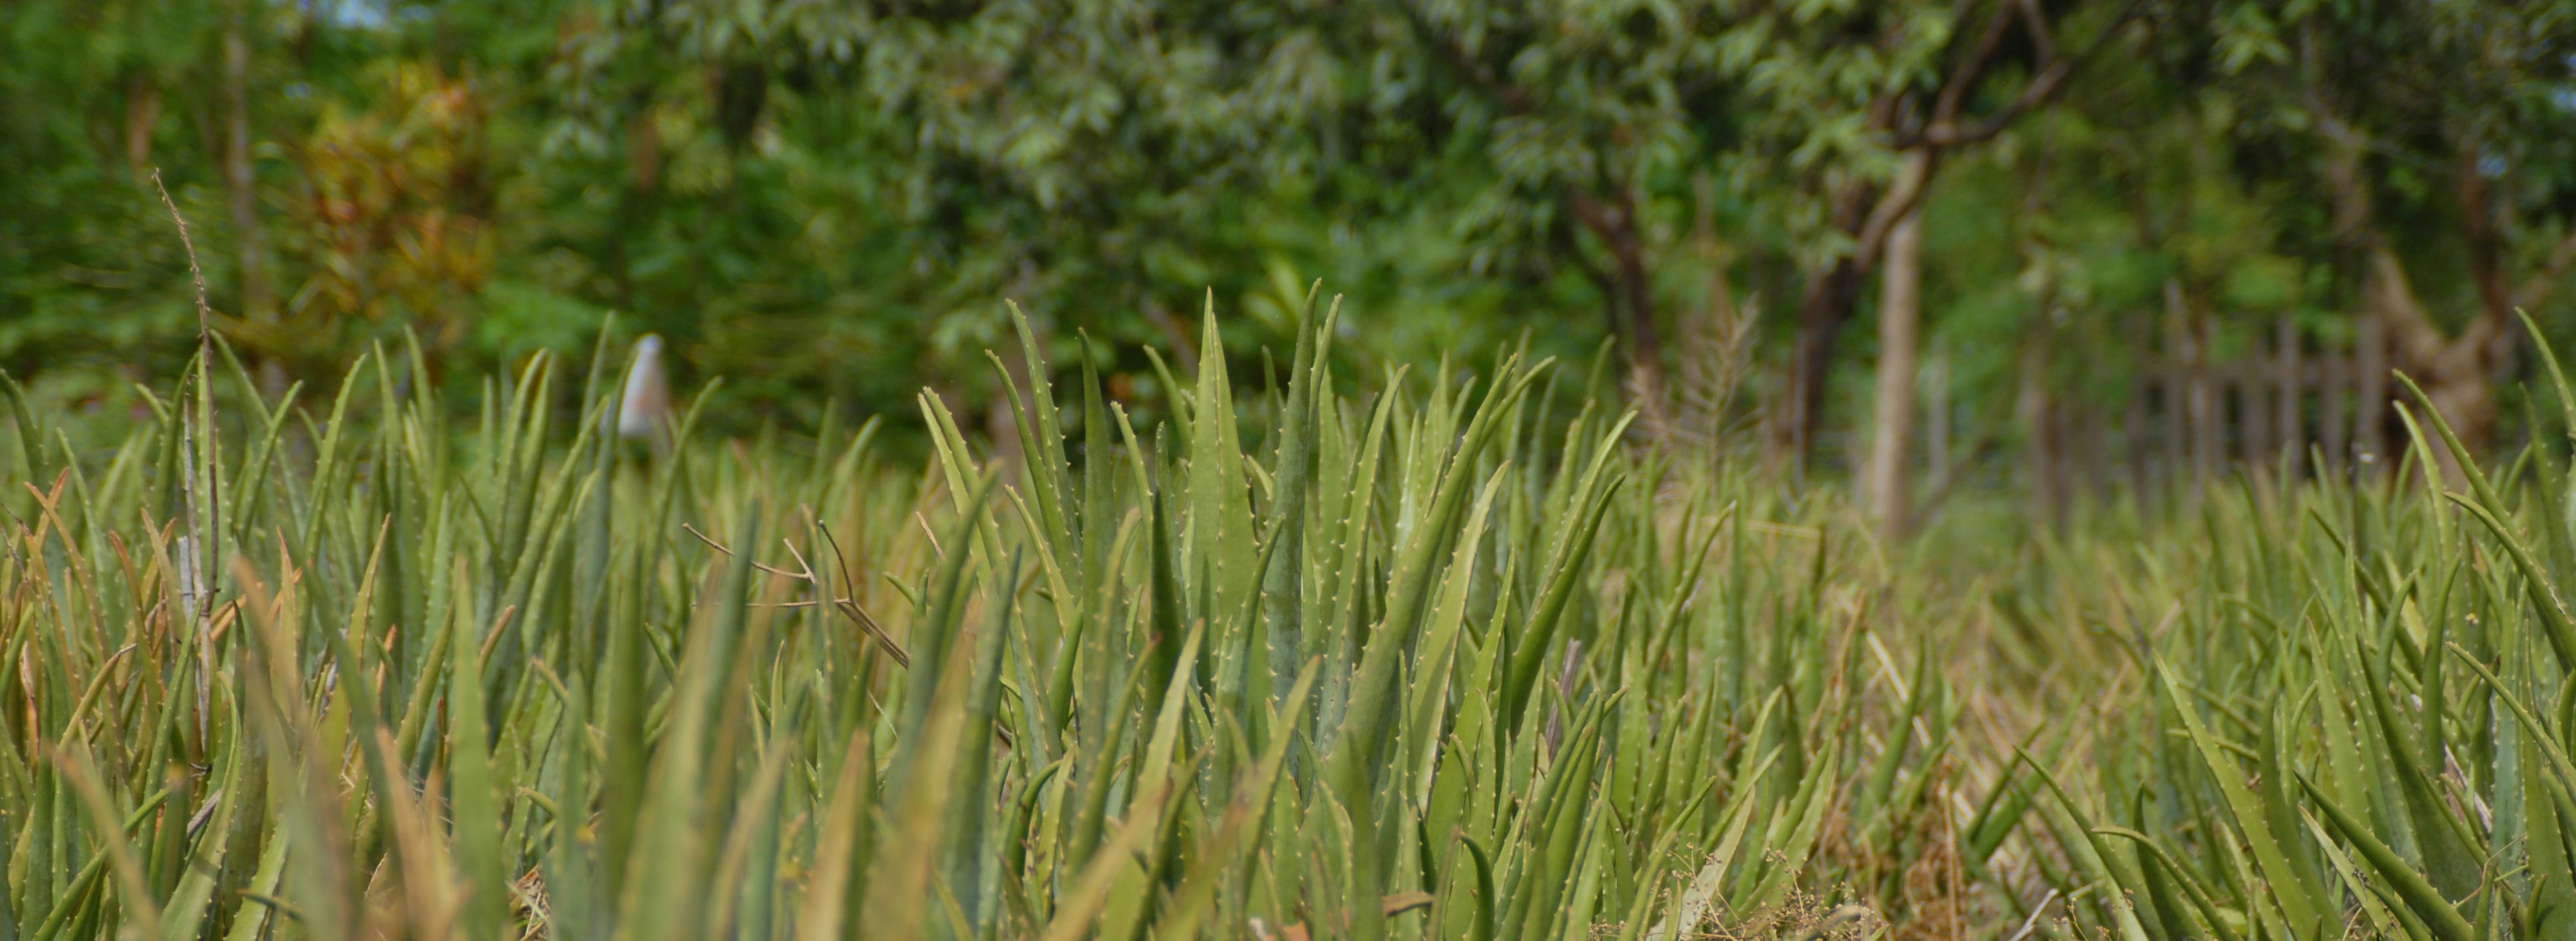 grüne Aloe Pflanzen wachsen in freier Umgebung